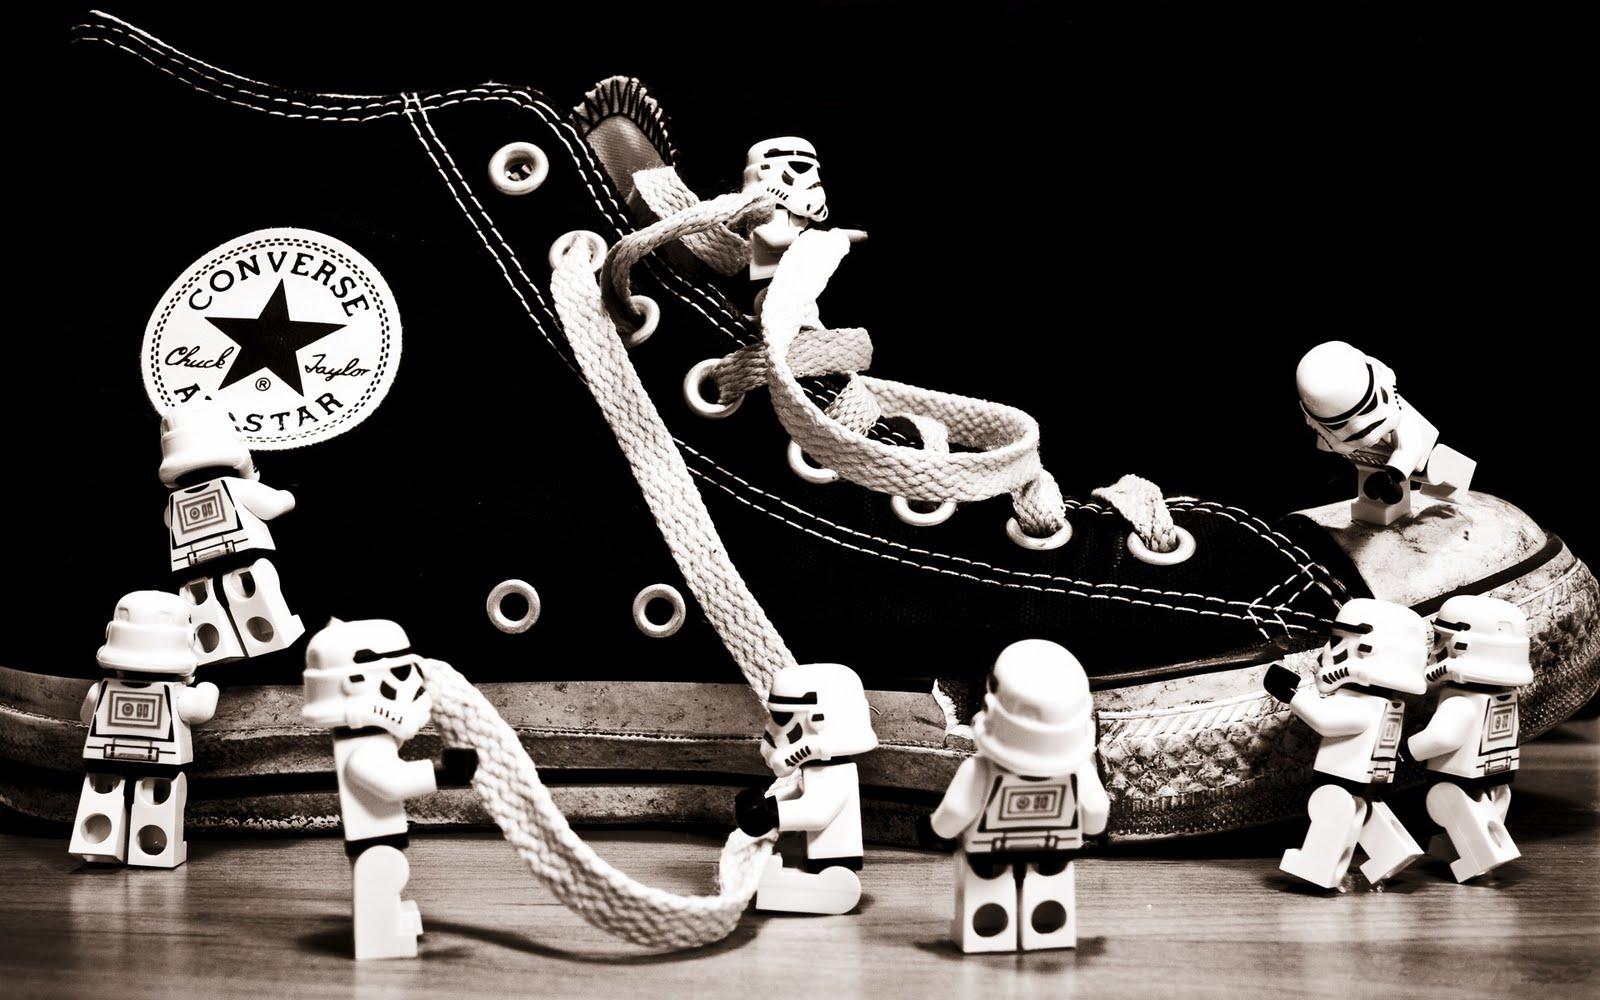 http://4.bp.blogspot.com/-8uXqxOhE2GM/TnJ2bo7vgNI/AAAAAAAADC4/zB1xCWS2DZs/s1600/Converse_All_Star_Lego_Star_Wars_Stormtroopers_HD_Wallpaper_Vvallpaper.Net.jpg